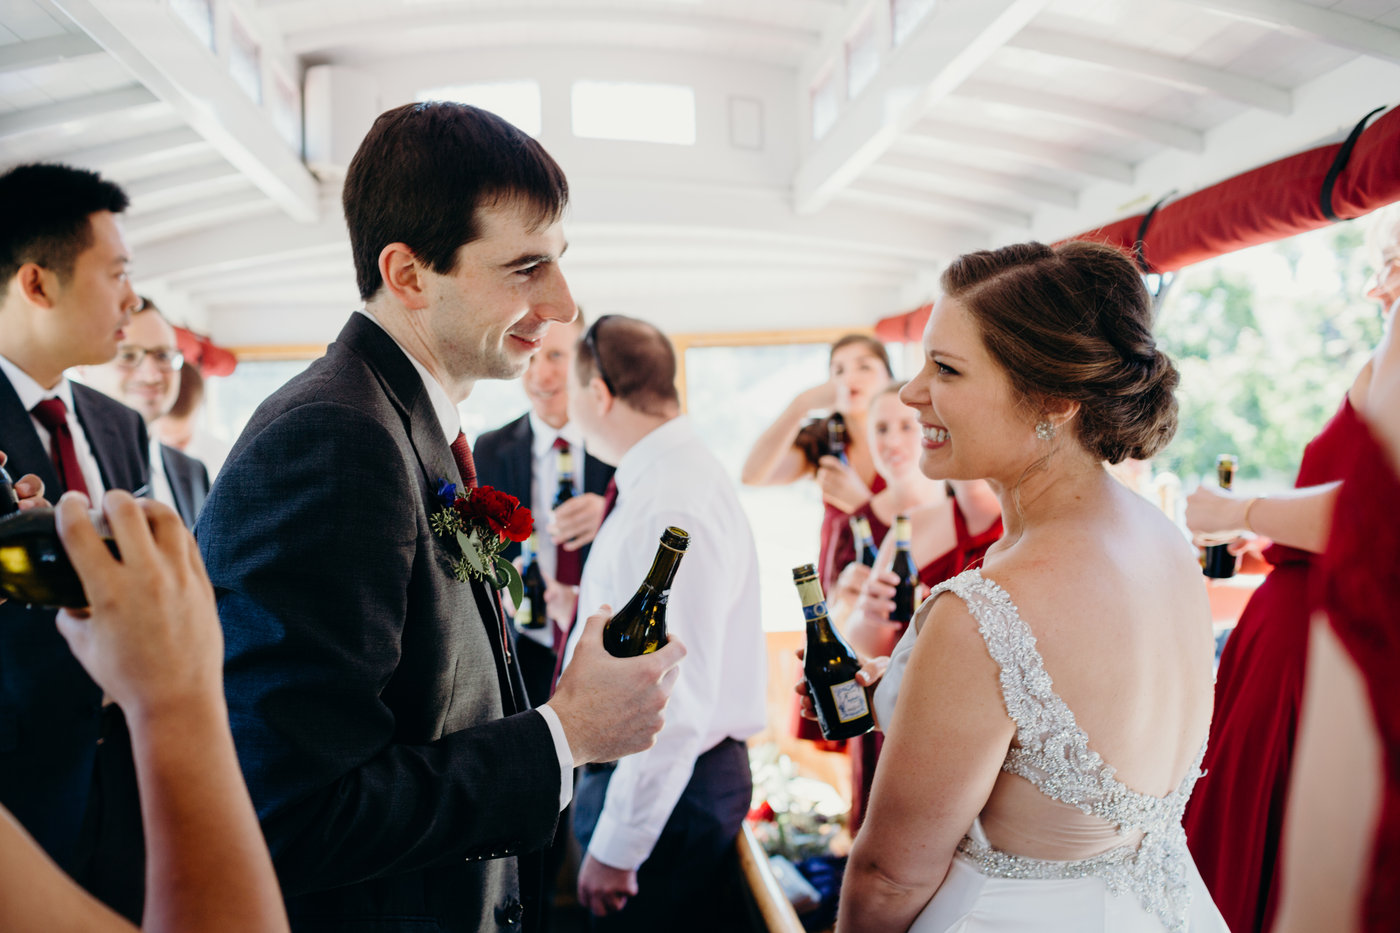 Ryan Jessica-Bridal Party-0194.jpg